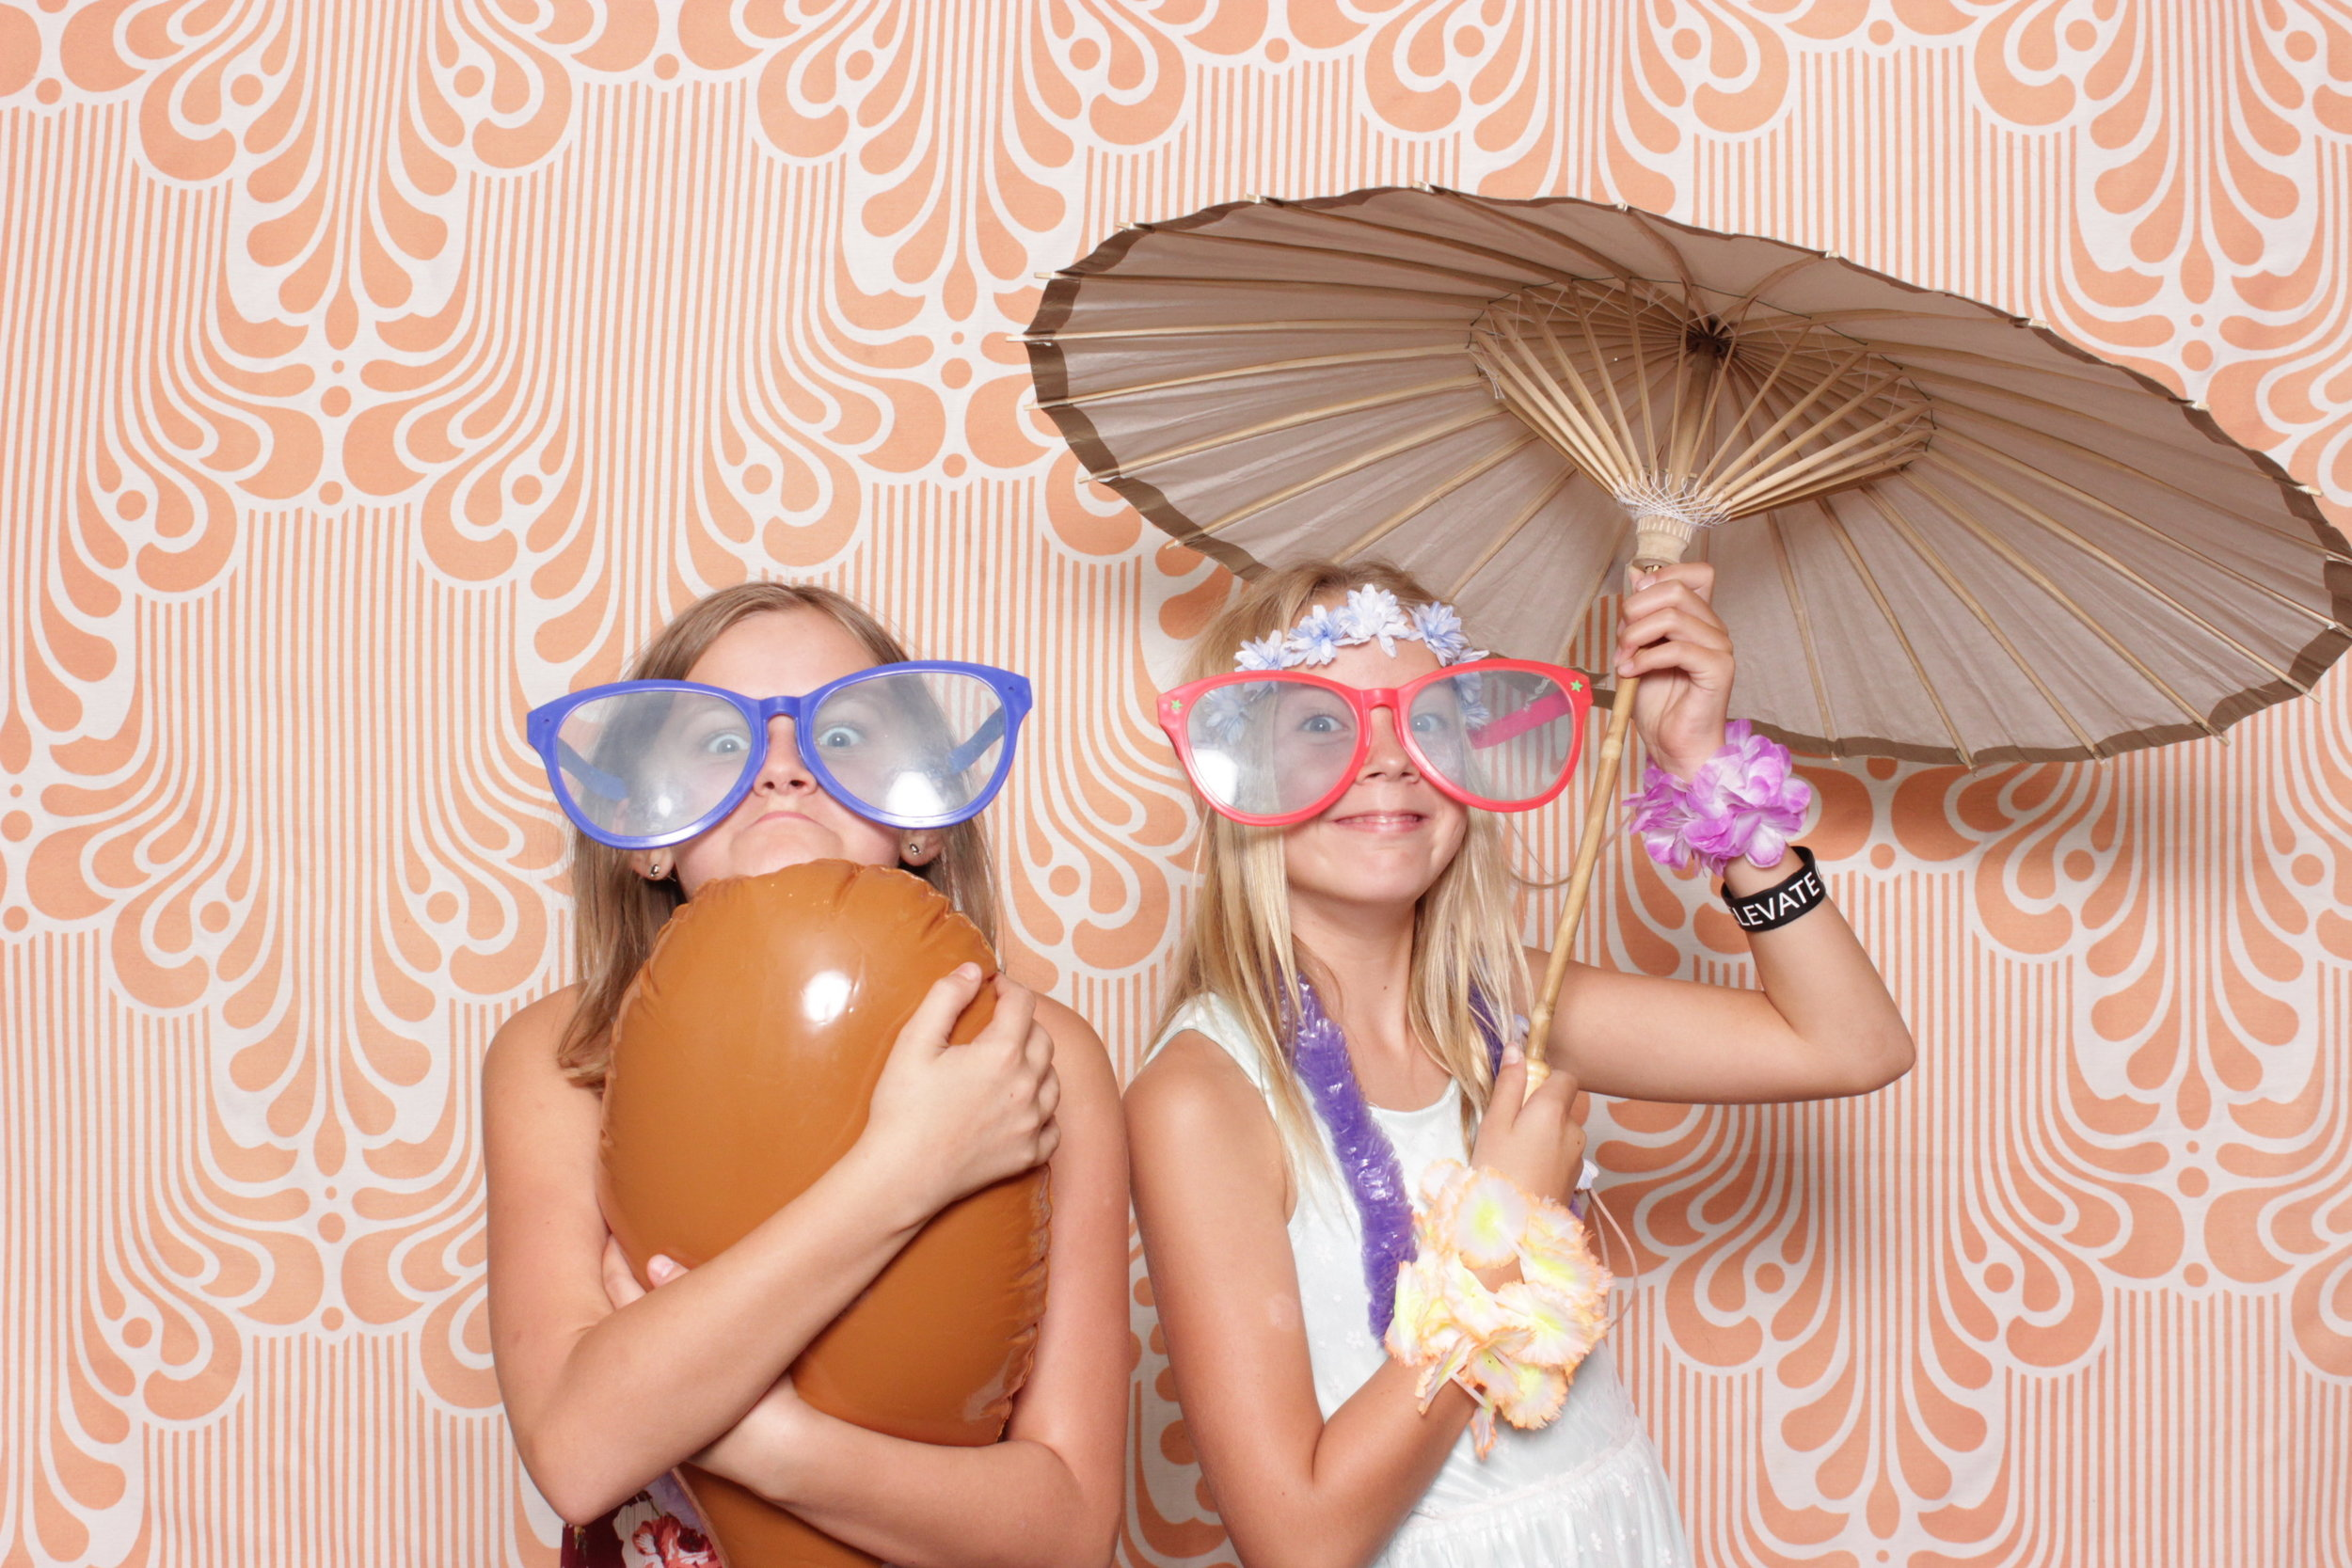 Infinite-hawaiian-luau-party-photo-booth-rental-chico